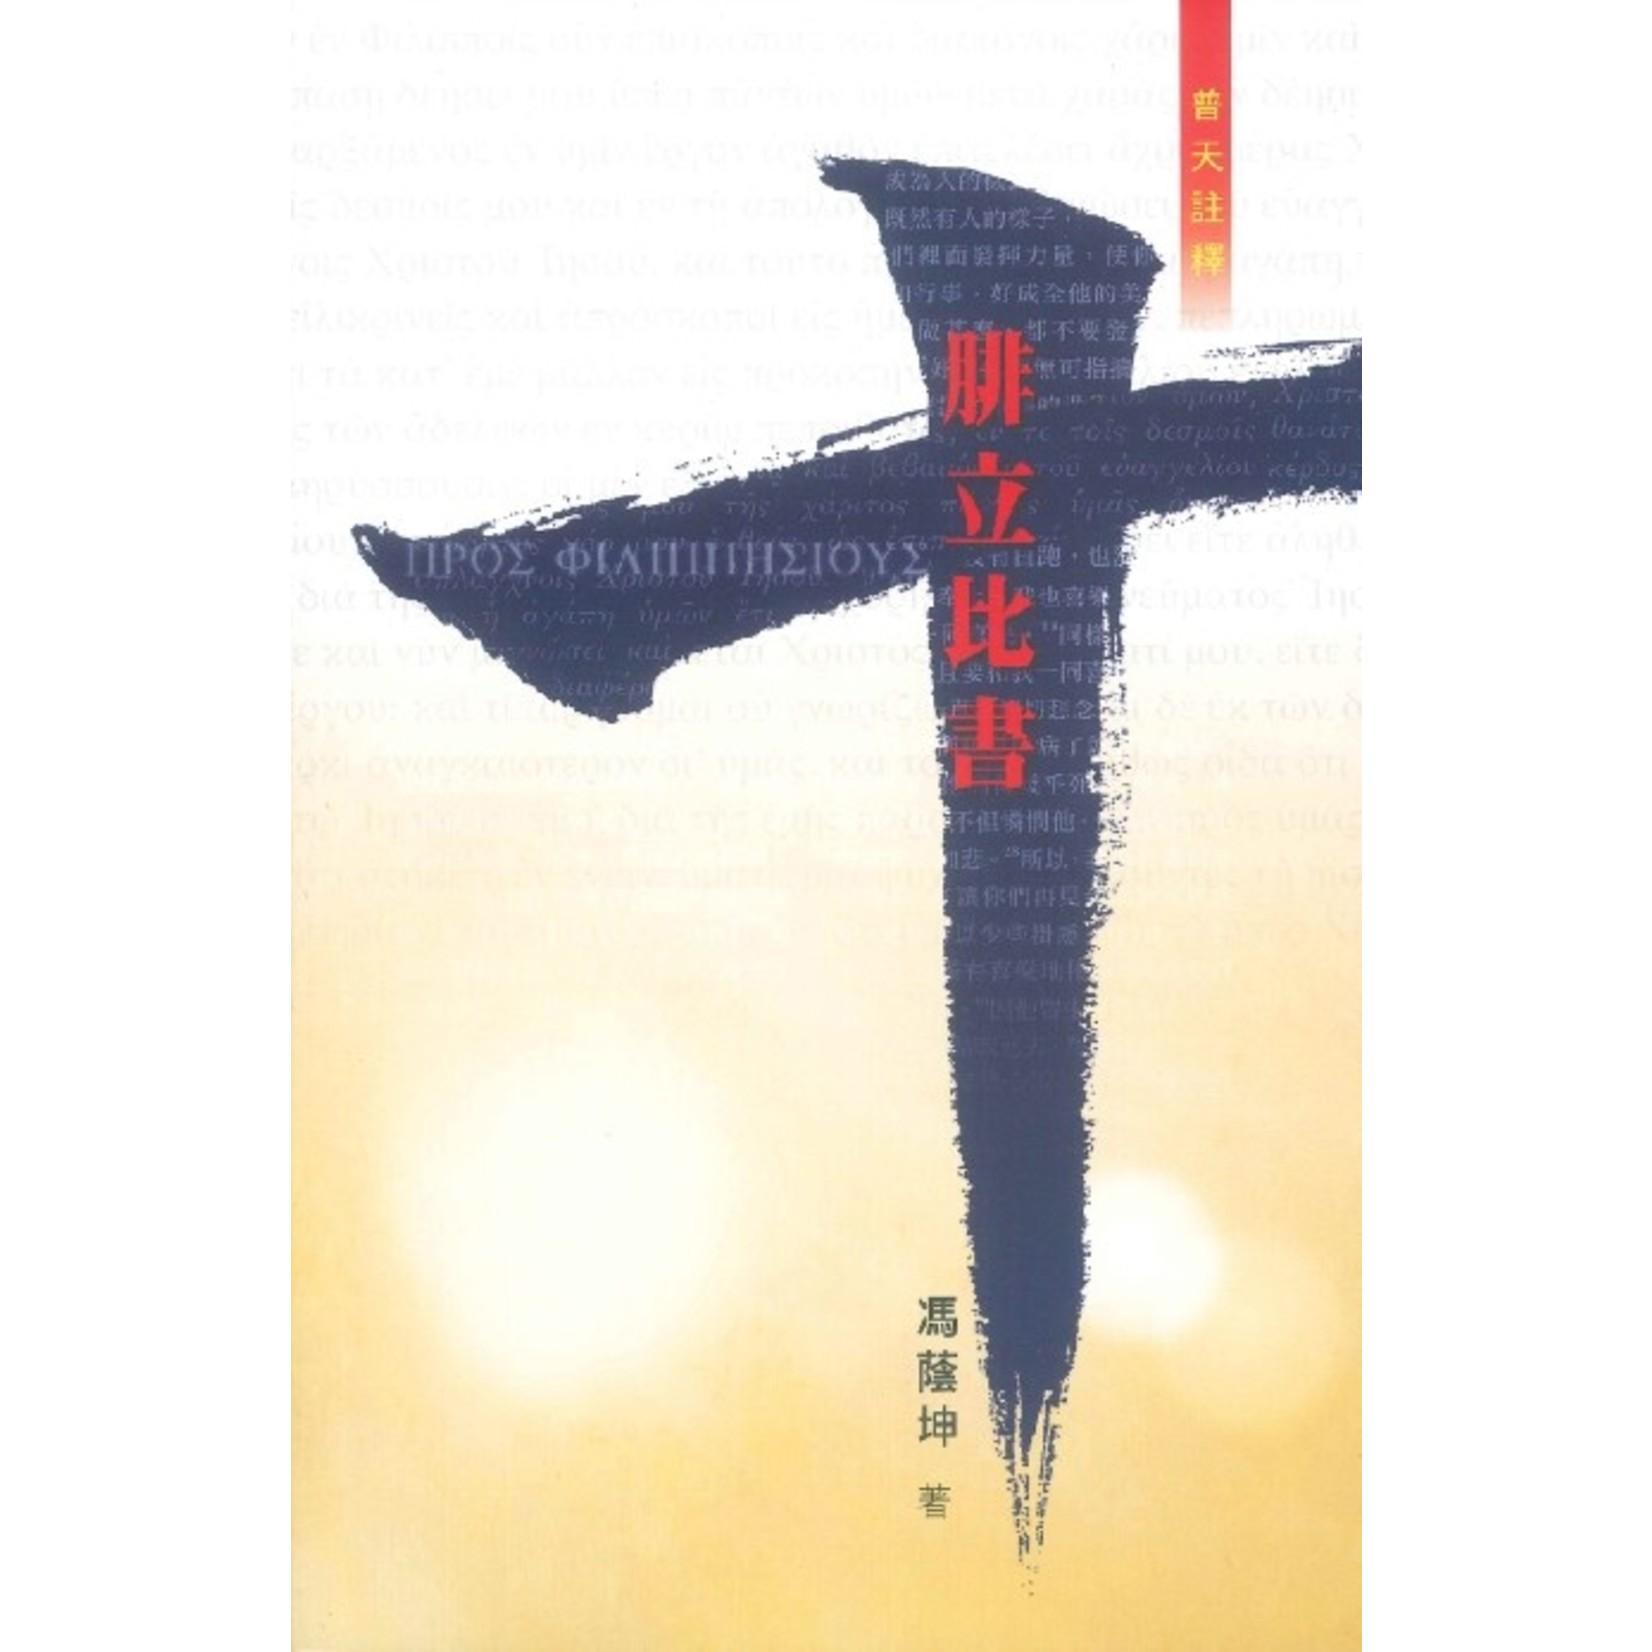 天道書樓 Tien Dao Publishing House 普天註釋:腓立比書